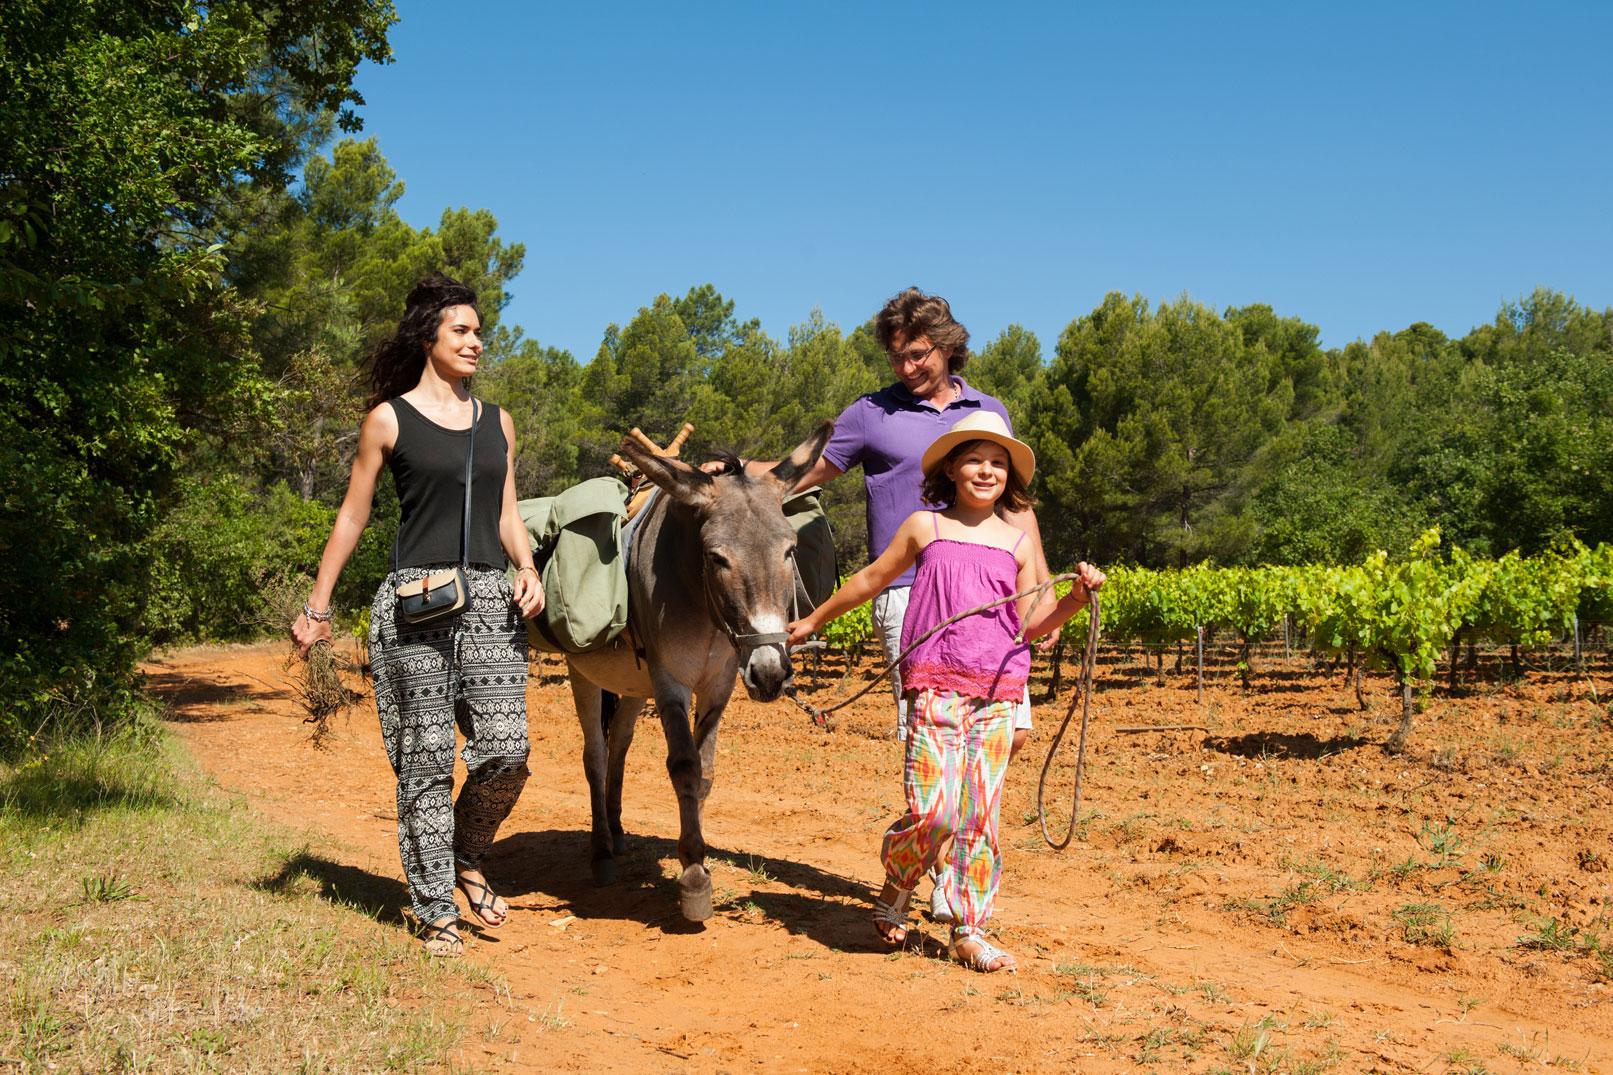 Balades avec les ânes en Provence @ Cintas Florès